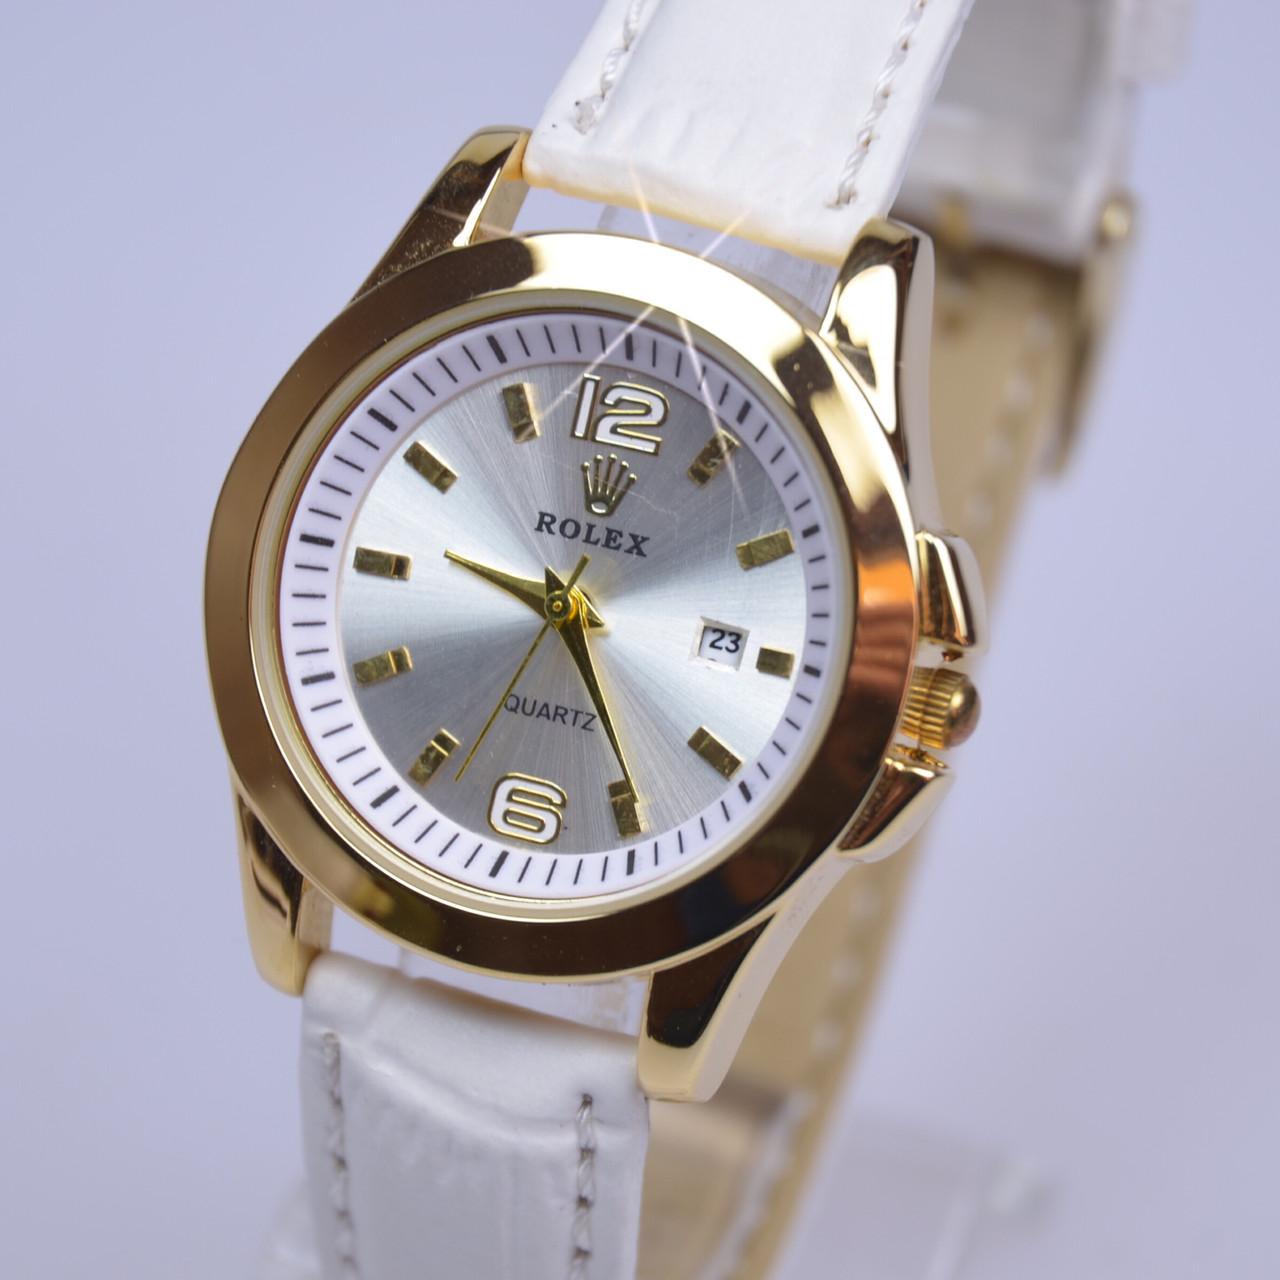 Женские наручные часы ROLE-X календарь (копия)